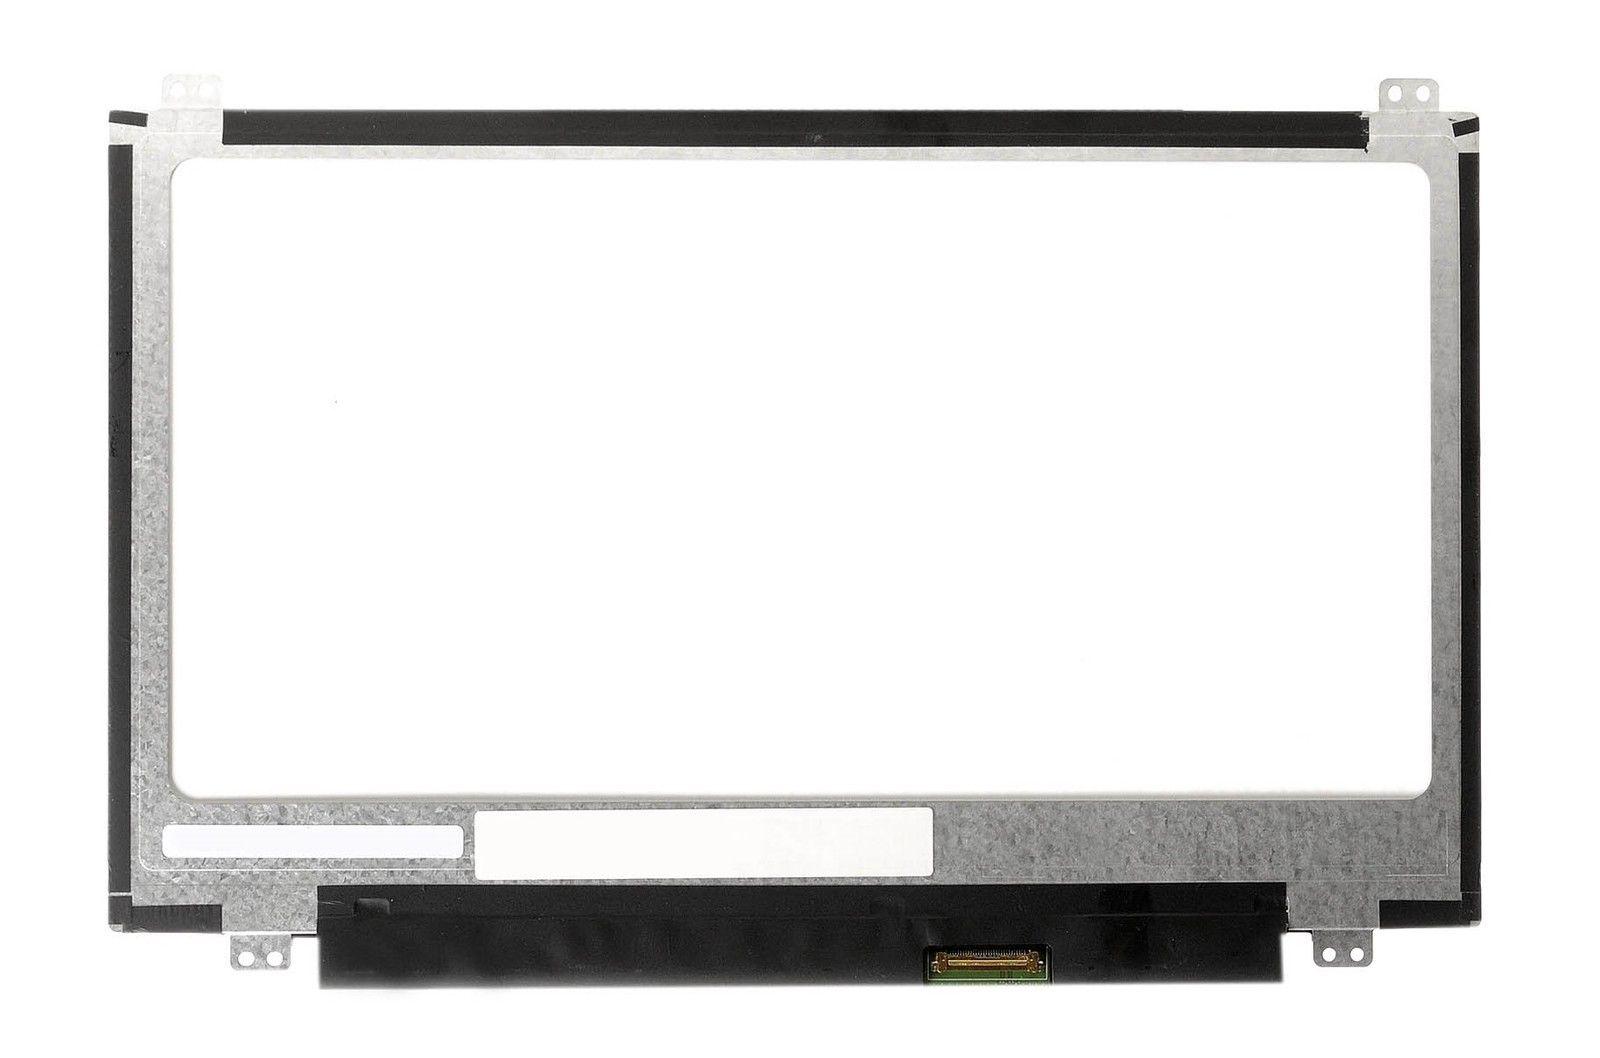 11.6 inch For ASUS X205 X205T X205TA laptop lcd screen N116BGE-EB2 b116xtn02.3 30Pin Slim up and down Screw hole 11.6 inch For ASUS X205 X205T X205TA laptop lcd screen N116BGE-EB2 b116xtn02.3 30Pin Slim up and down Screw hole